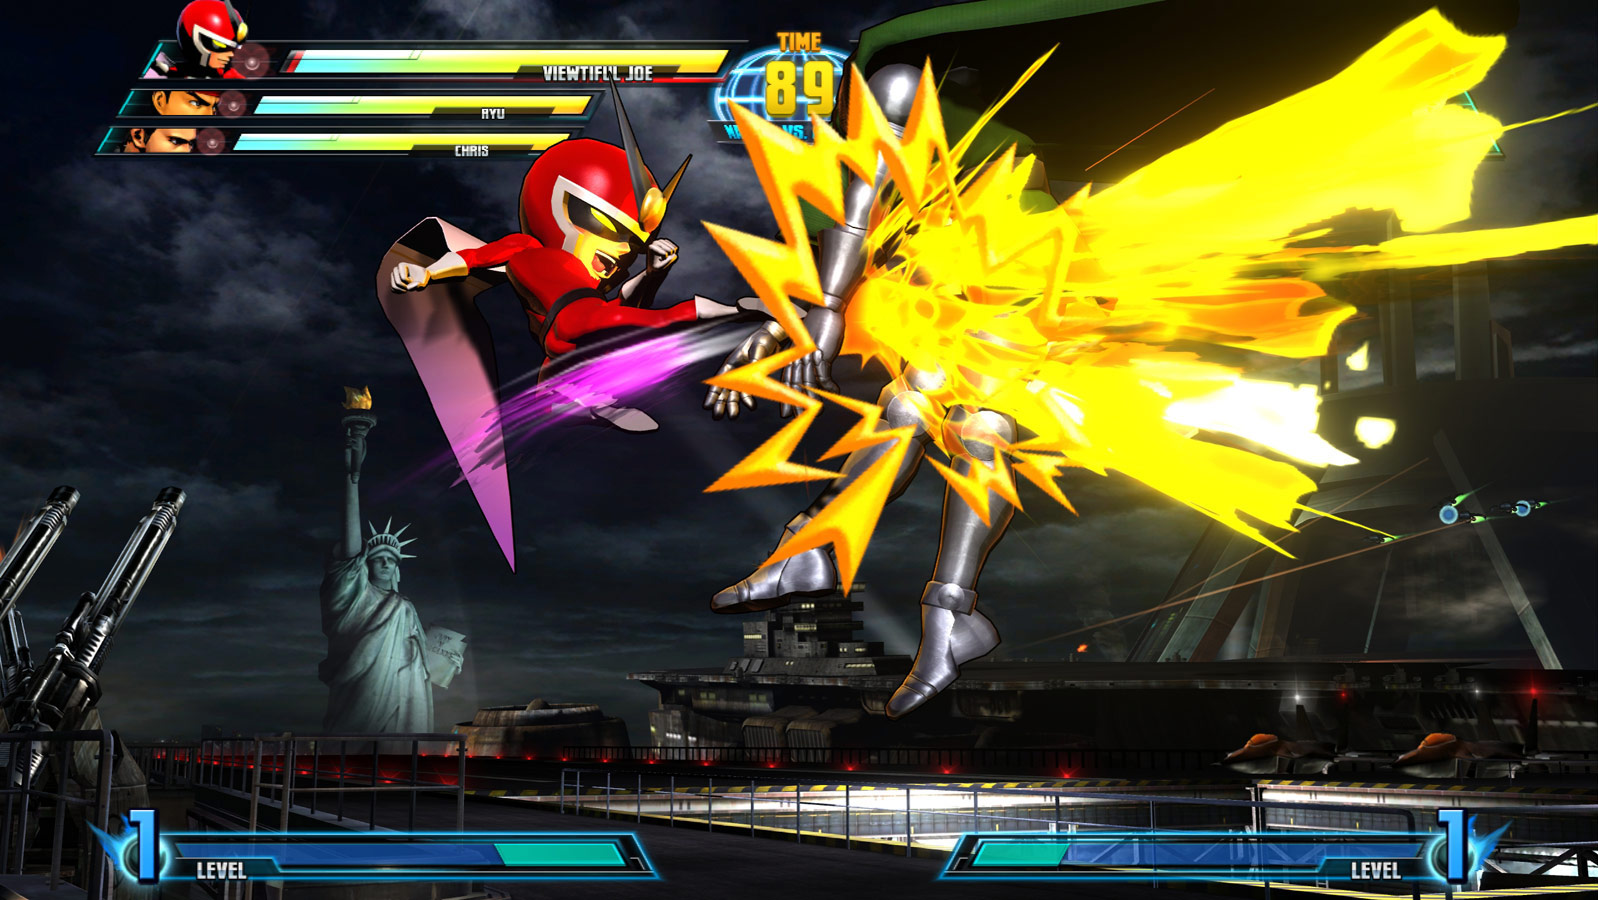 Marvel vs. Capcom 3 screen shot Aug. 18 image #11